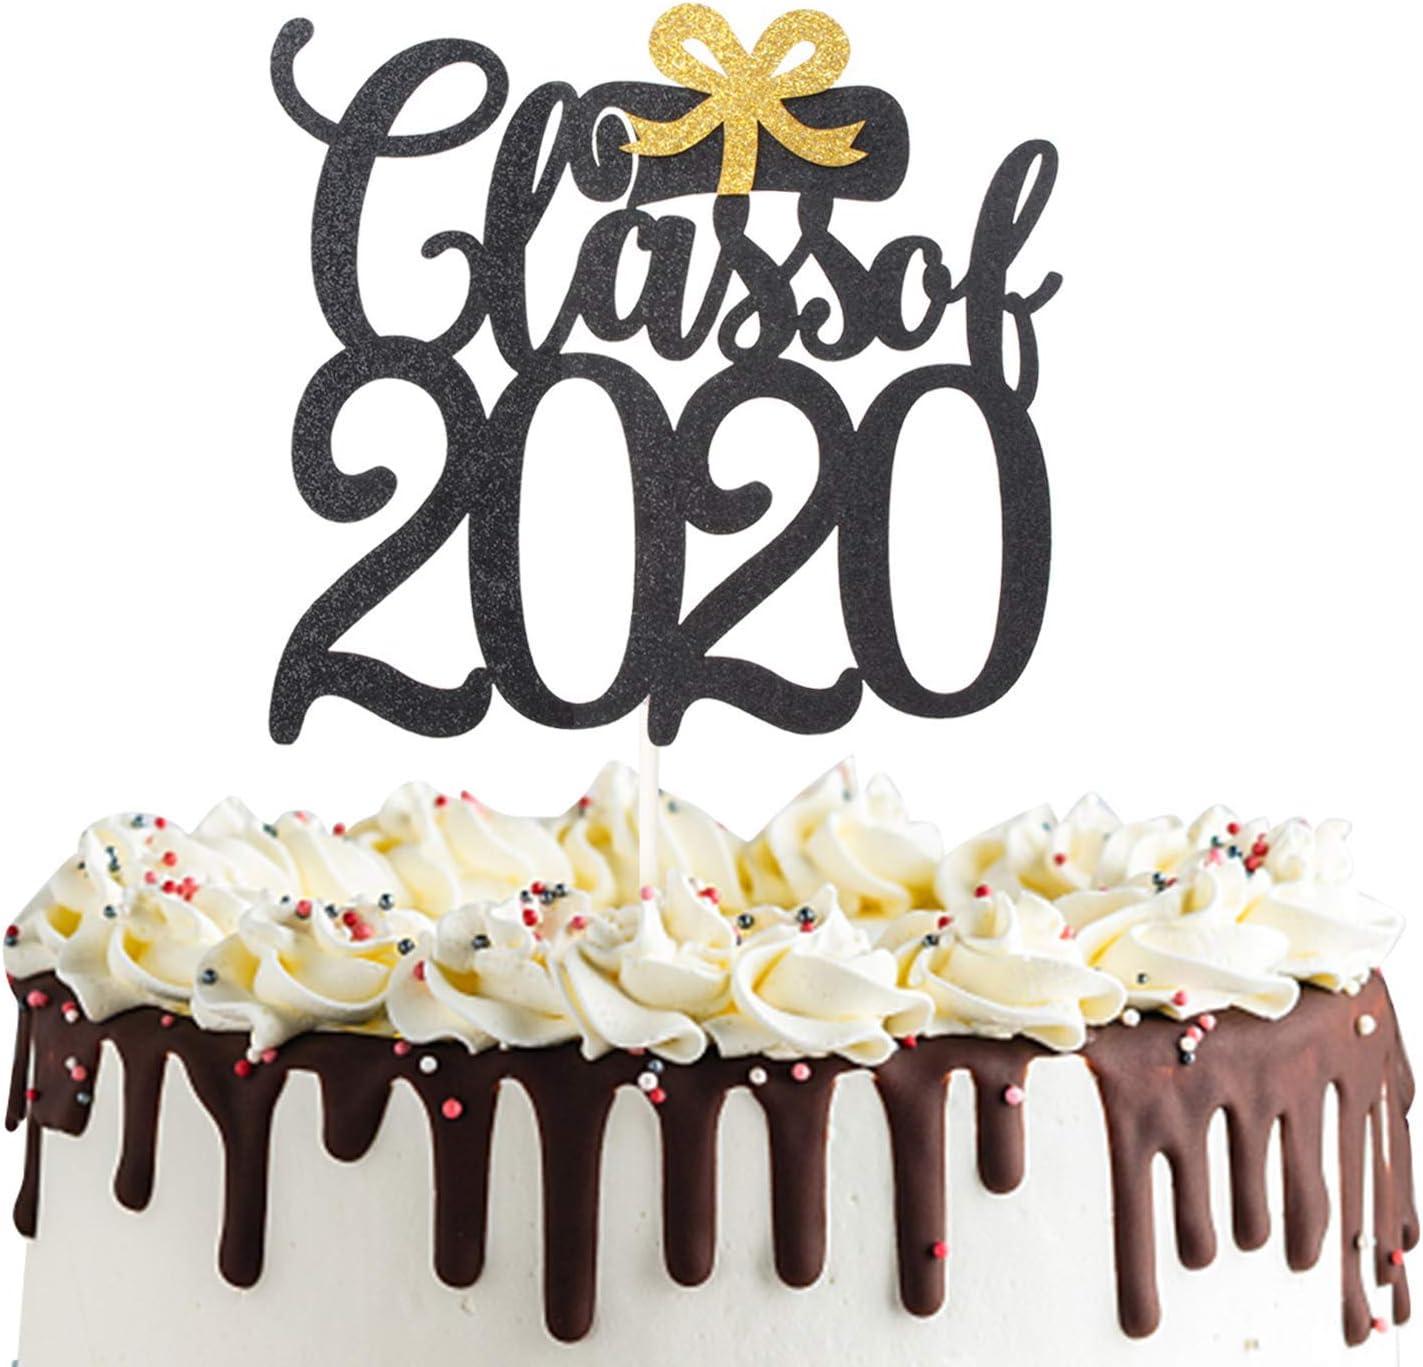 Class of 2020 Cake Topper, Congrats Grad Cake Decor for Graduation Party Decorations Graduate Supplies